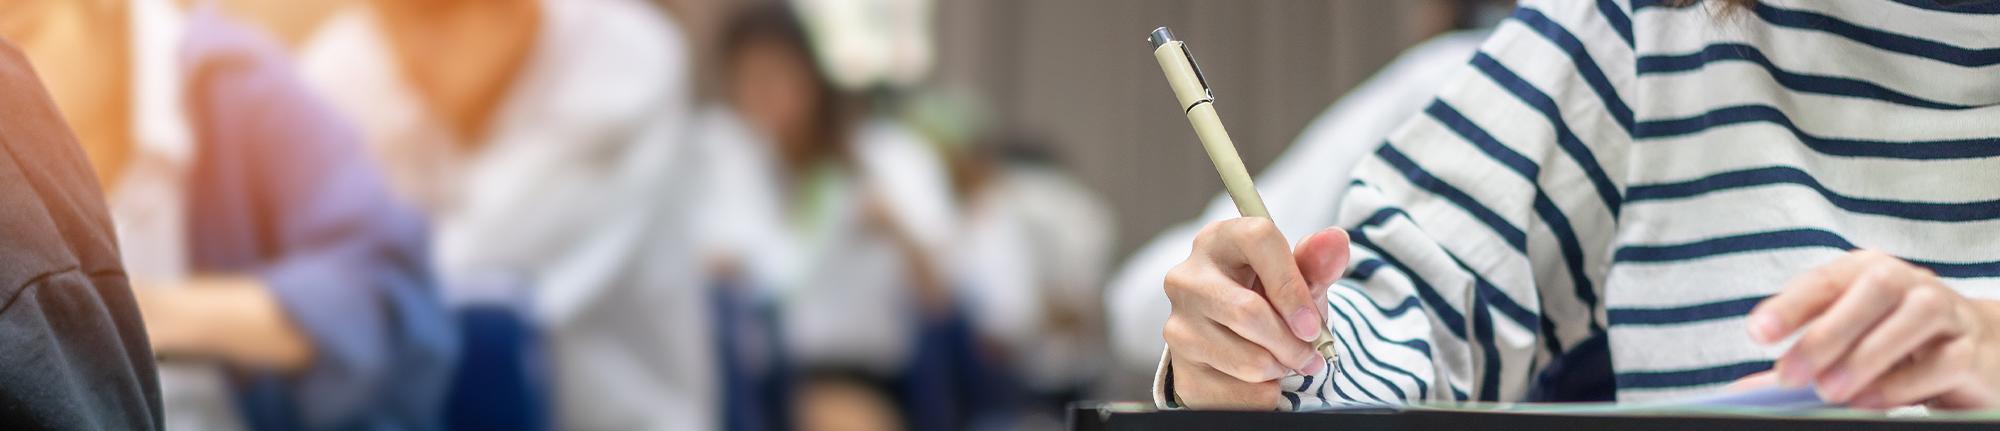 students sitting at desks writing